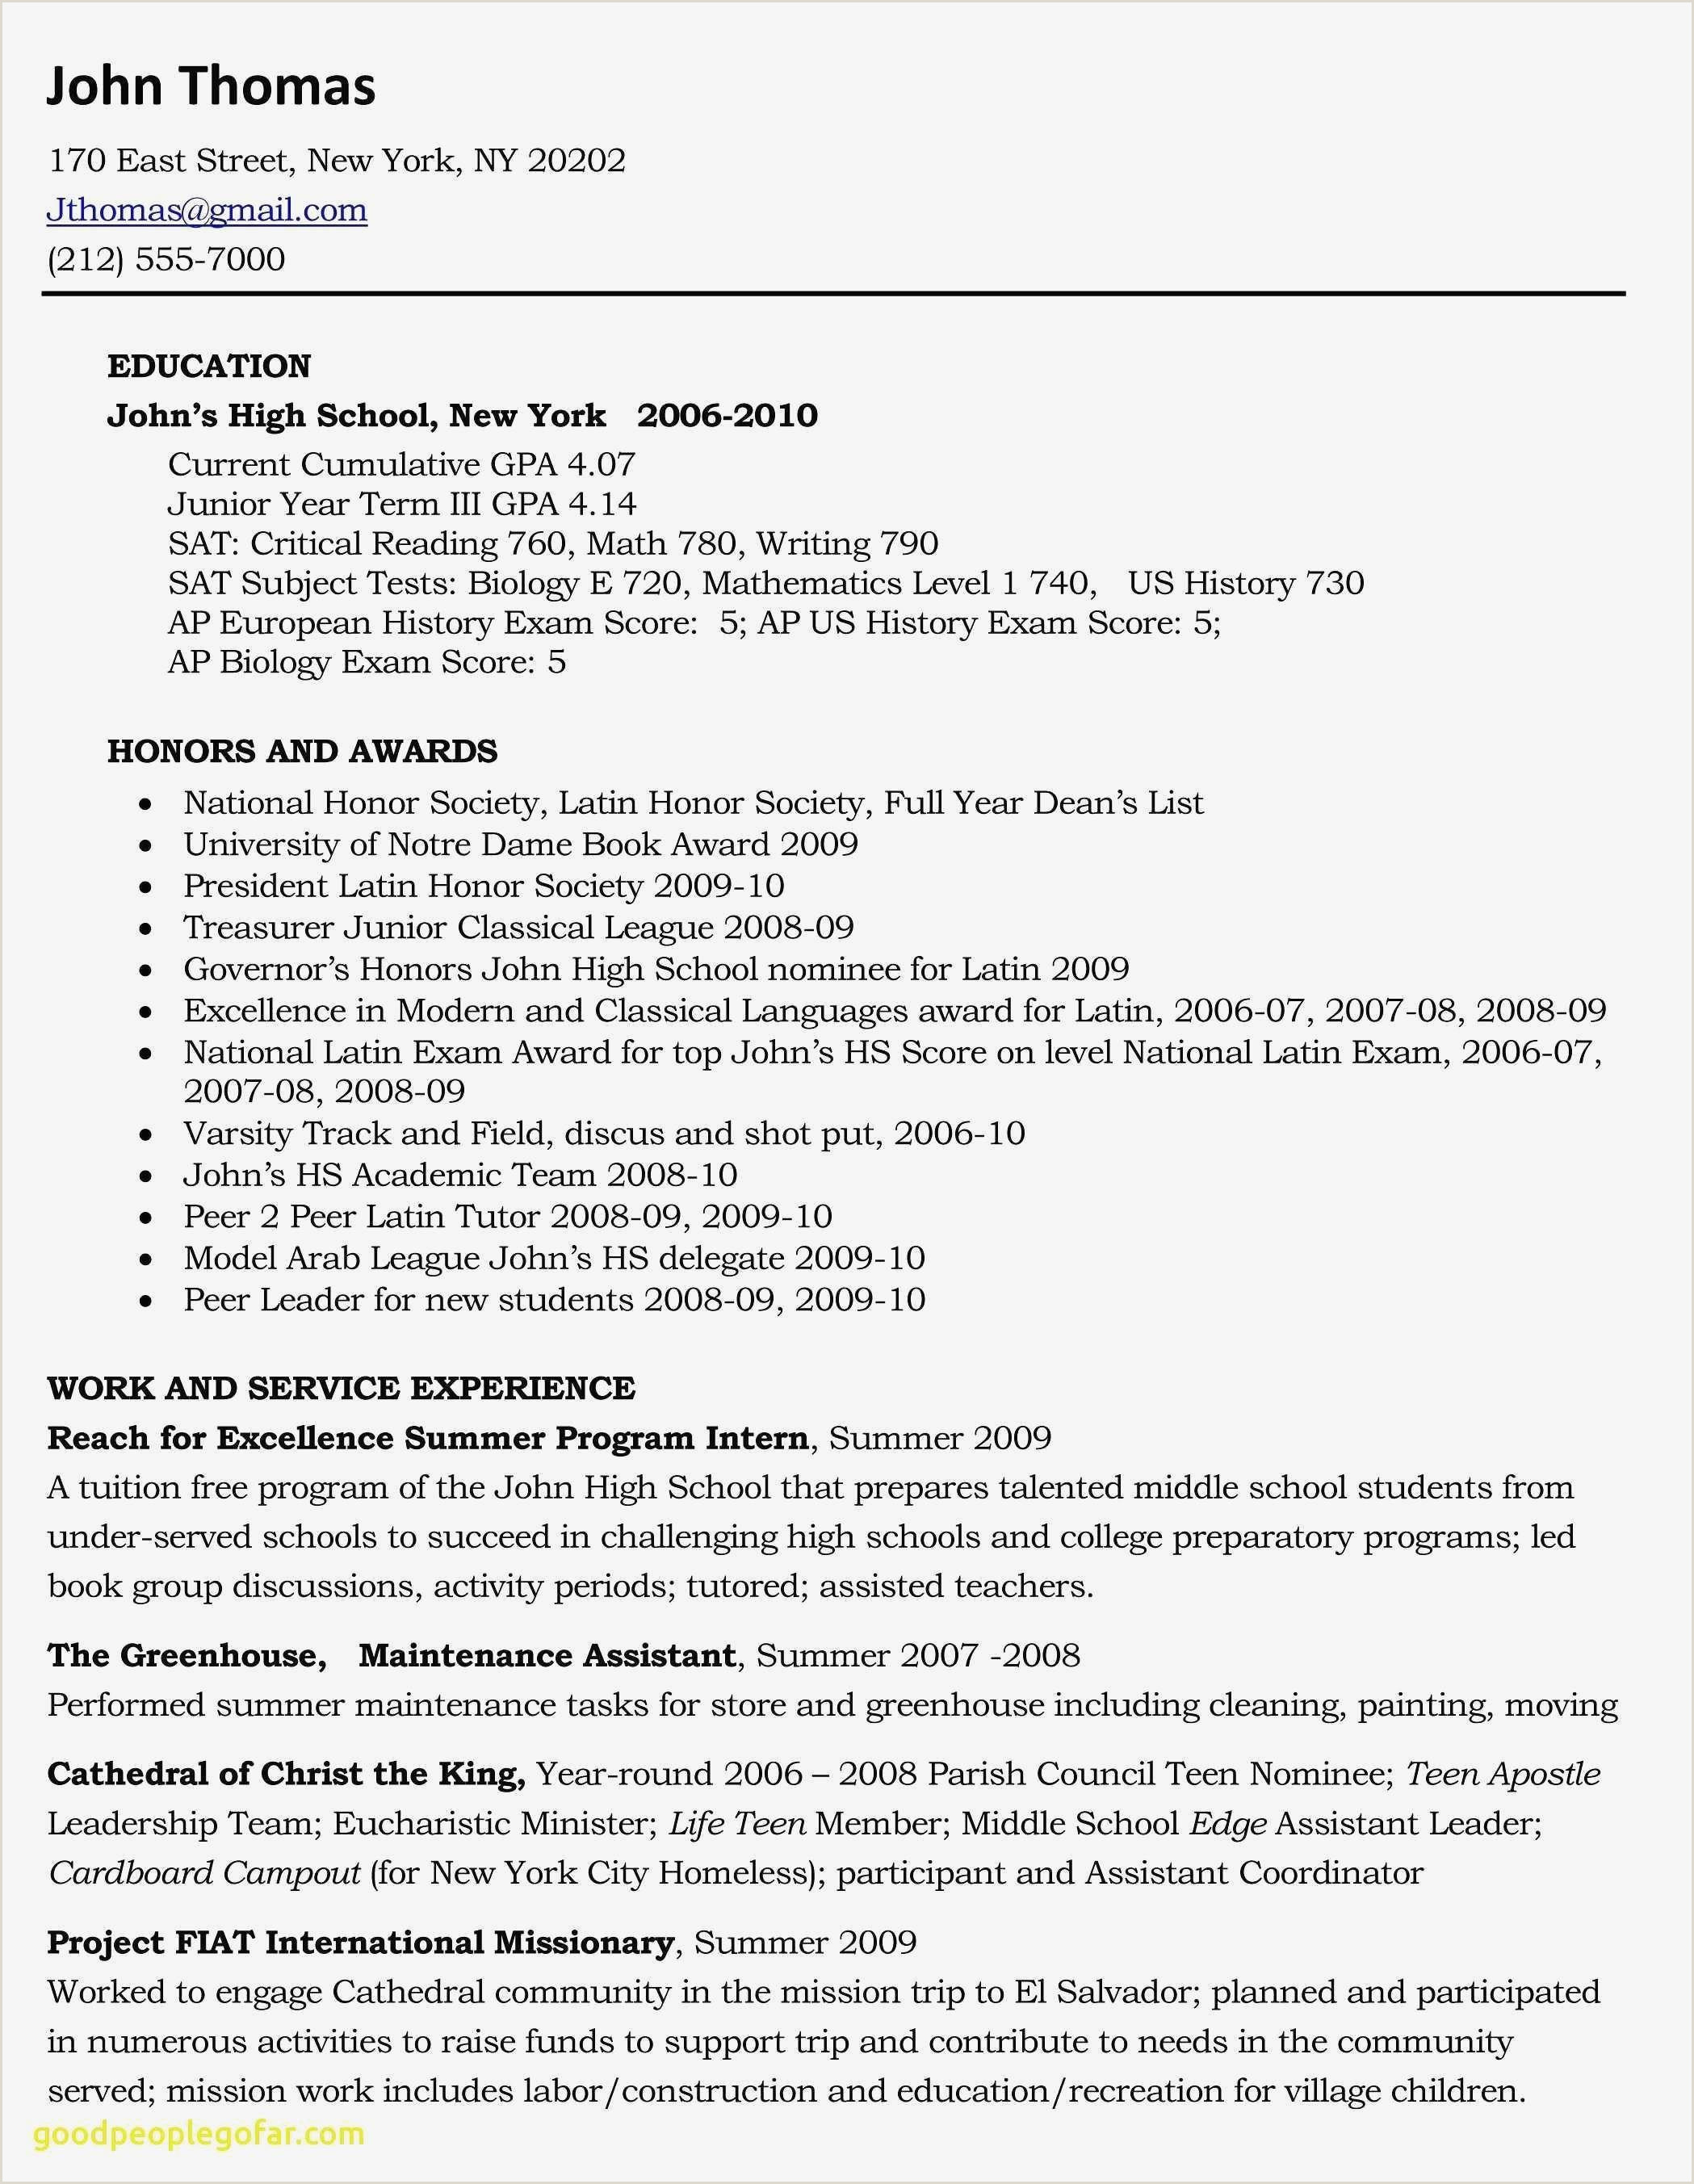 Modele De Cv Batiment Gratuit Agréable Fresh Blank Resume